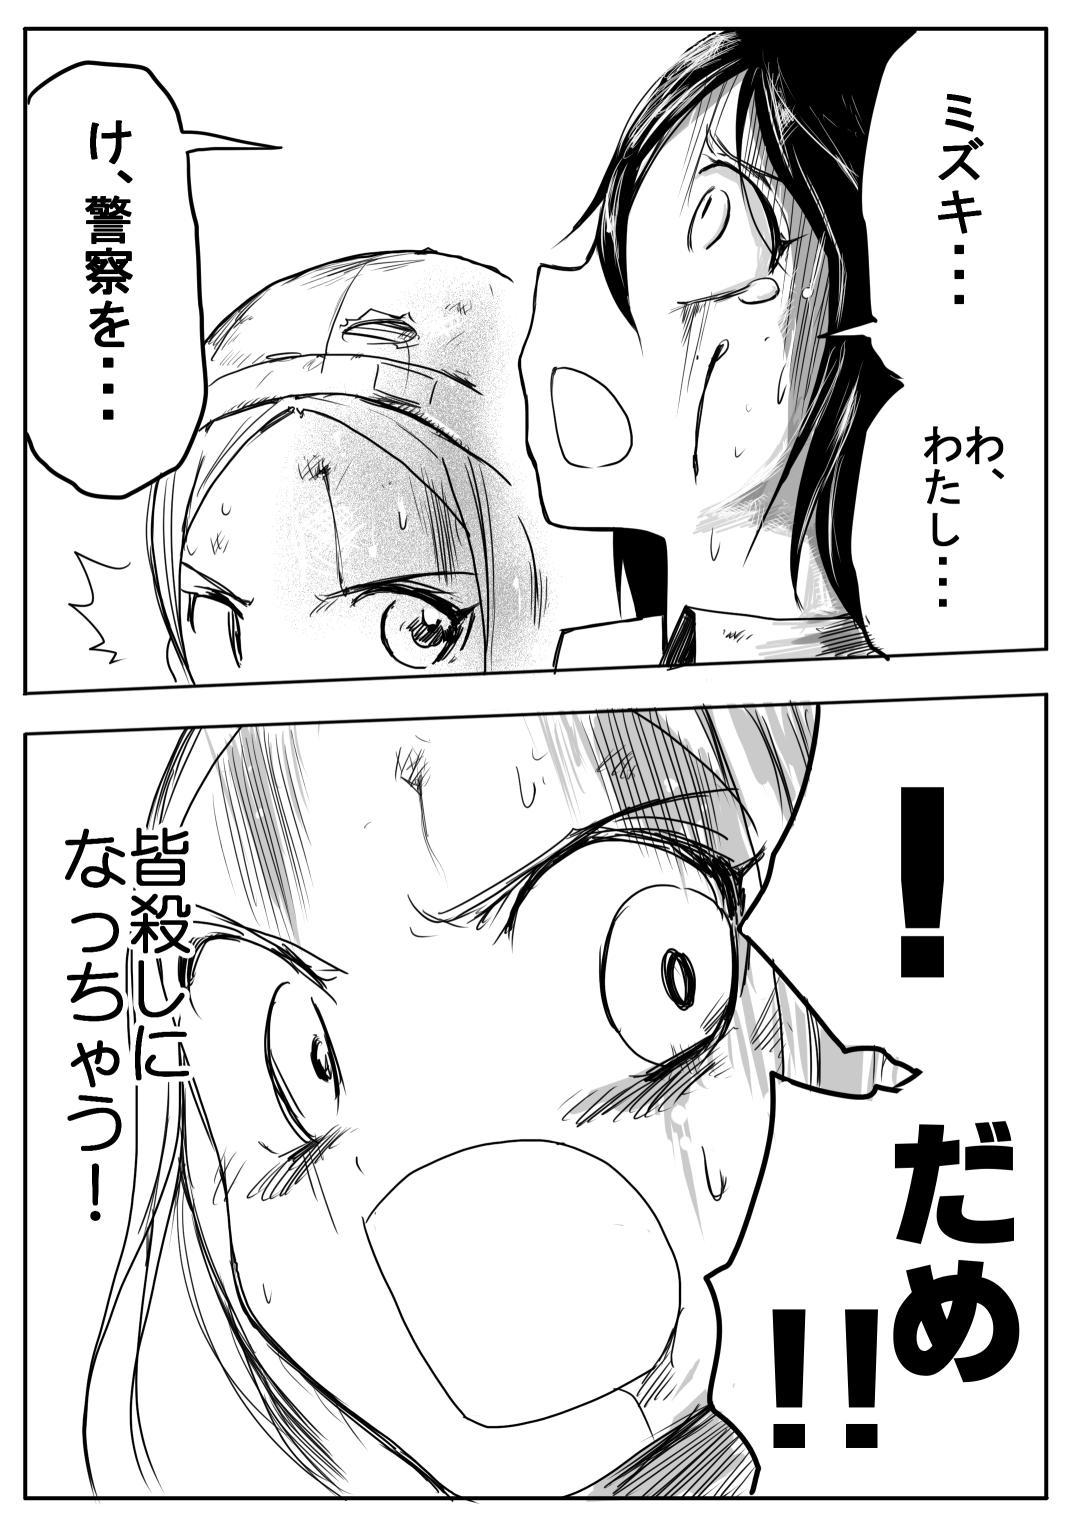 Sukumizu Senshi Ryona Manga 2-kan 71